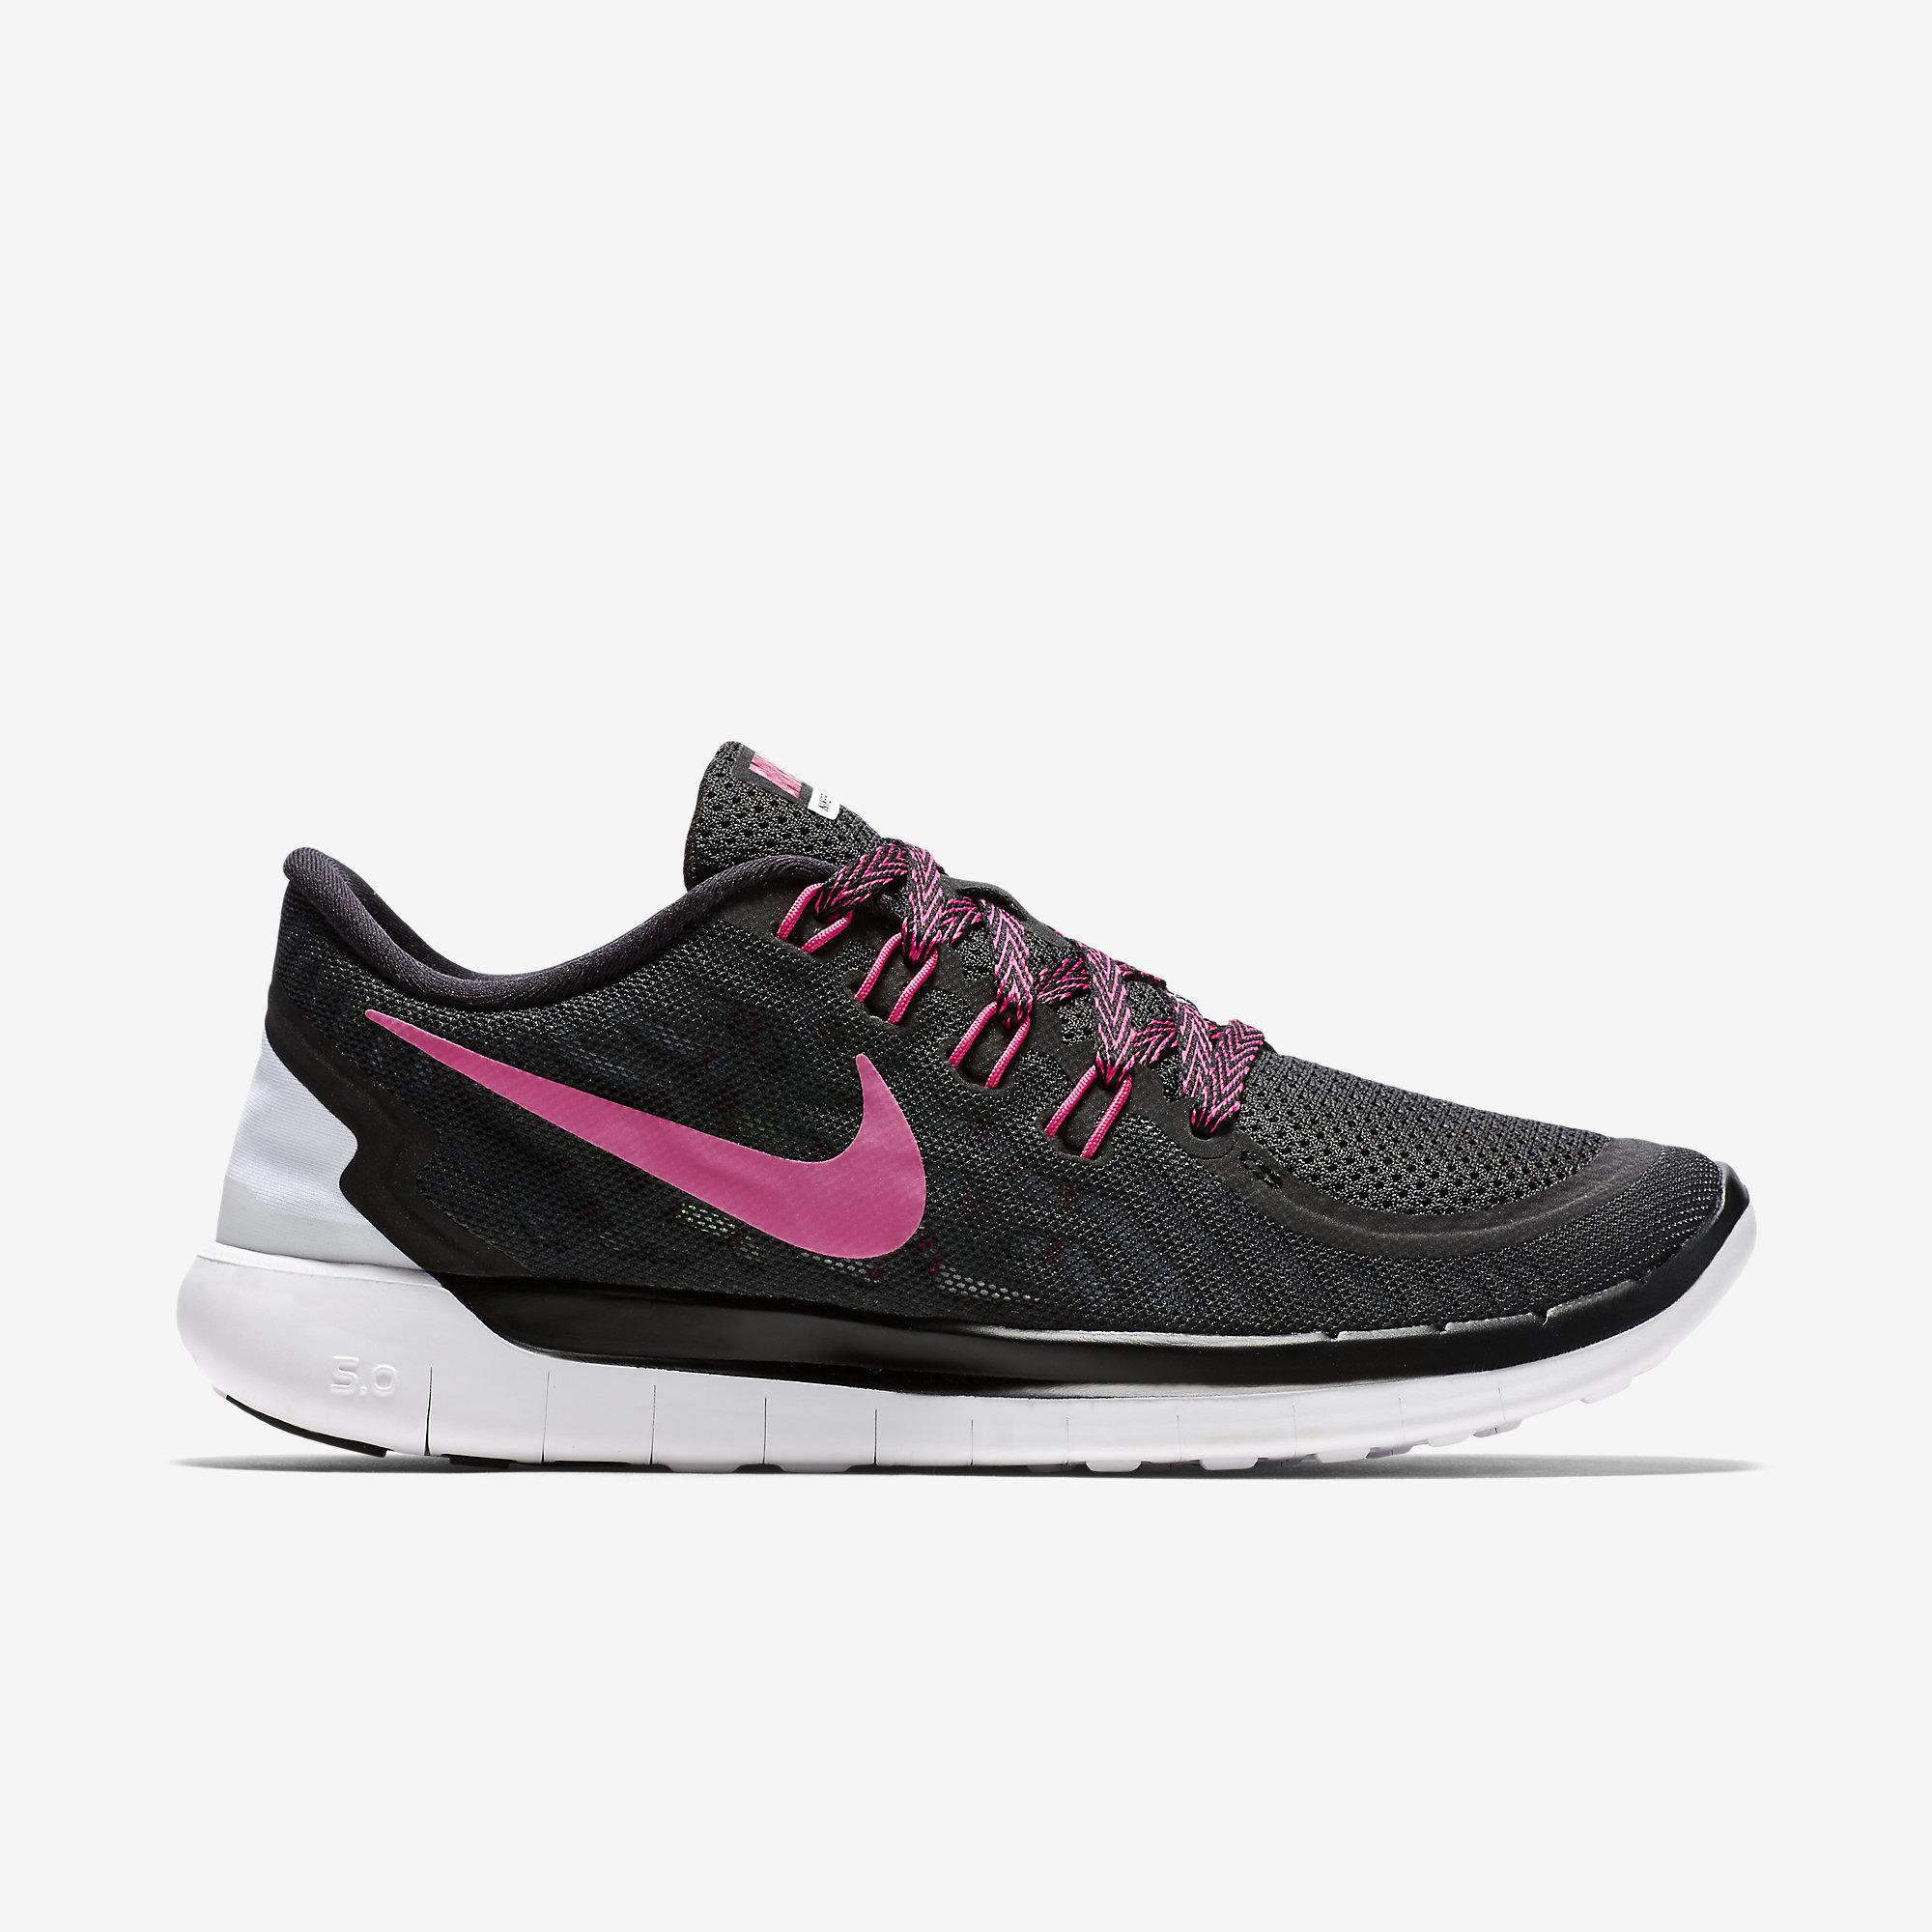 quality design 8343f 42585 Nike Womens Free 5.0 Running Shoes - Black Pink - Tennisnuts.com